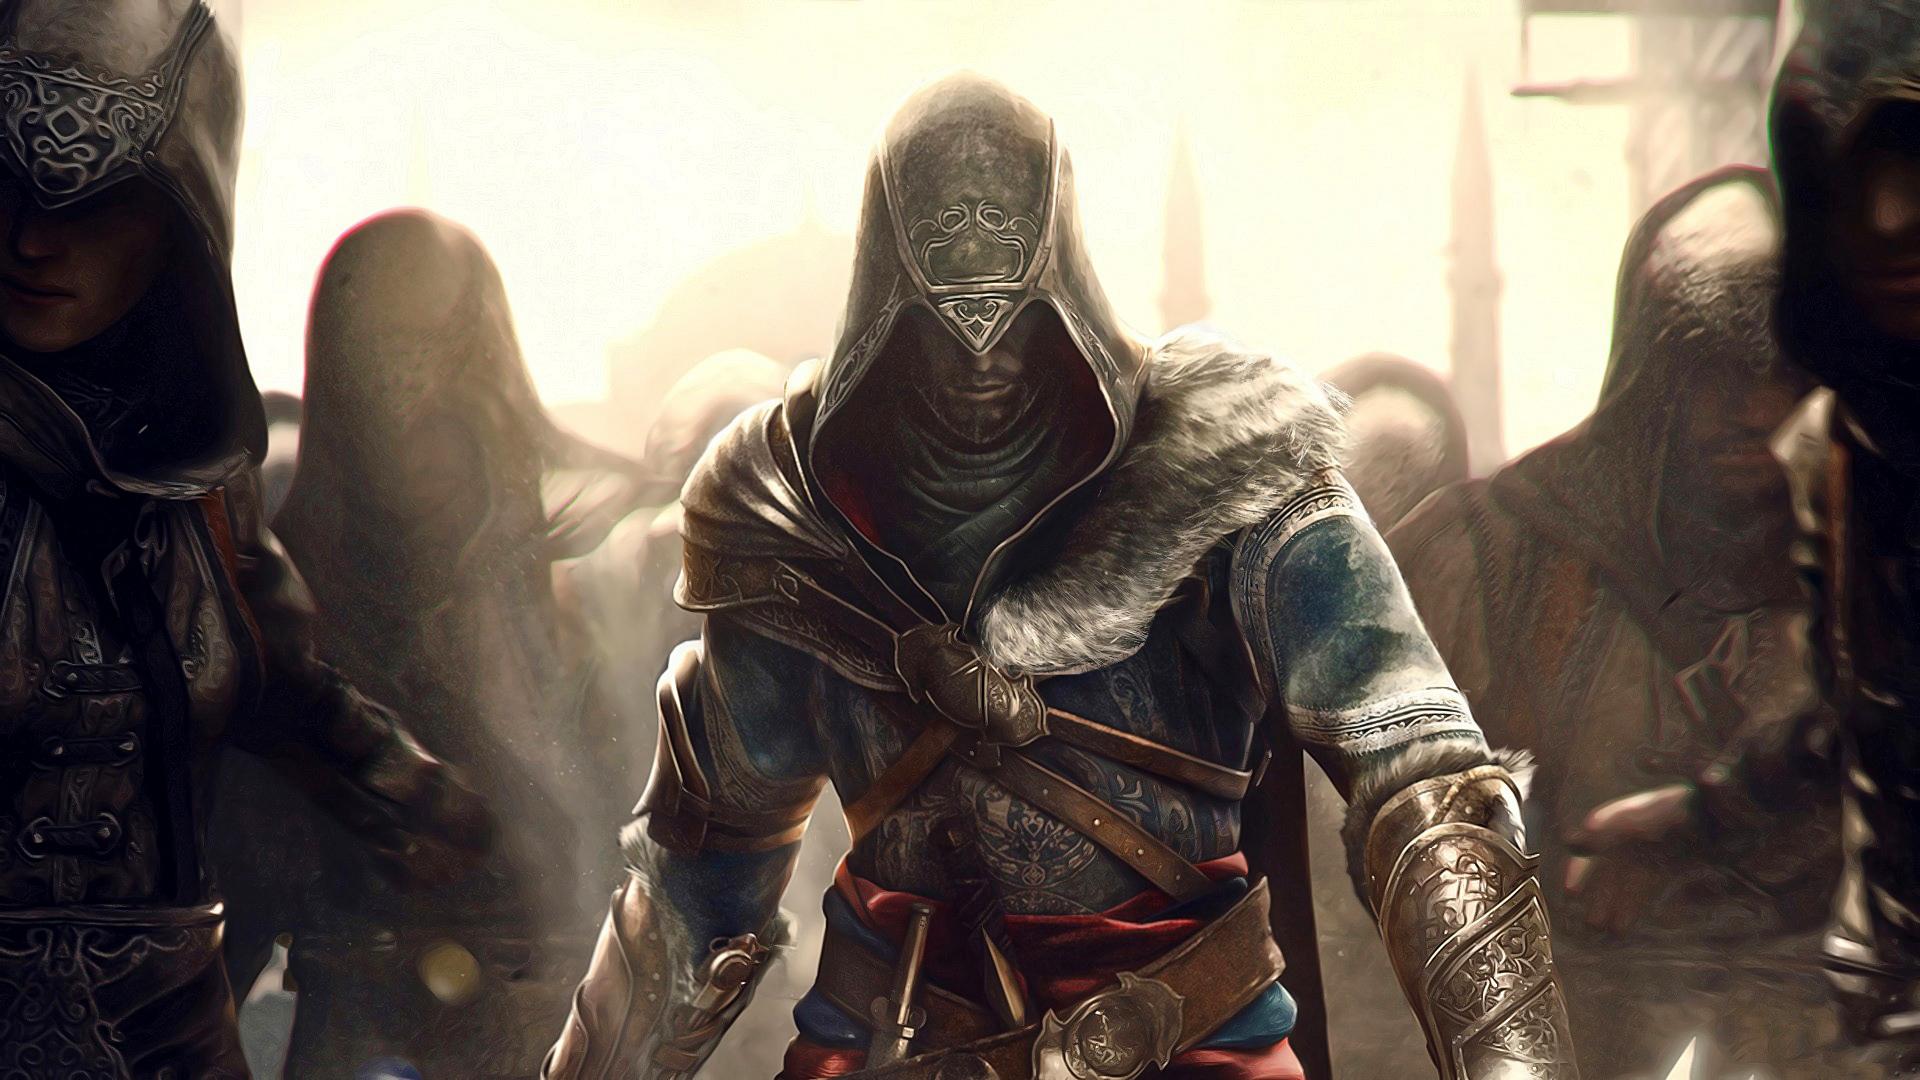 [40+] Assassin's Creed Brotherhood Wallpaper HD on ...Assassins Creed Brotherhood Wallpaper 1920x1080